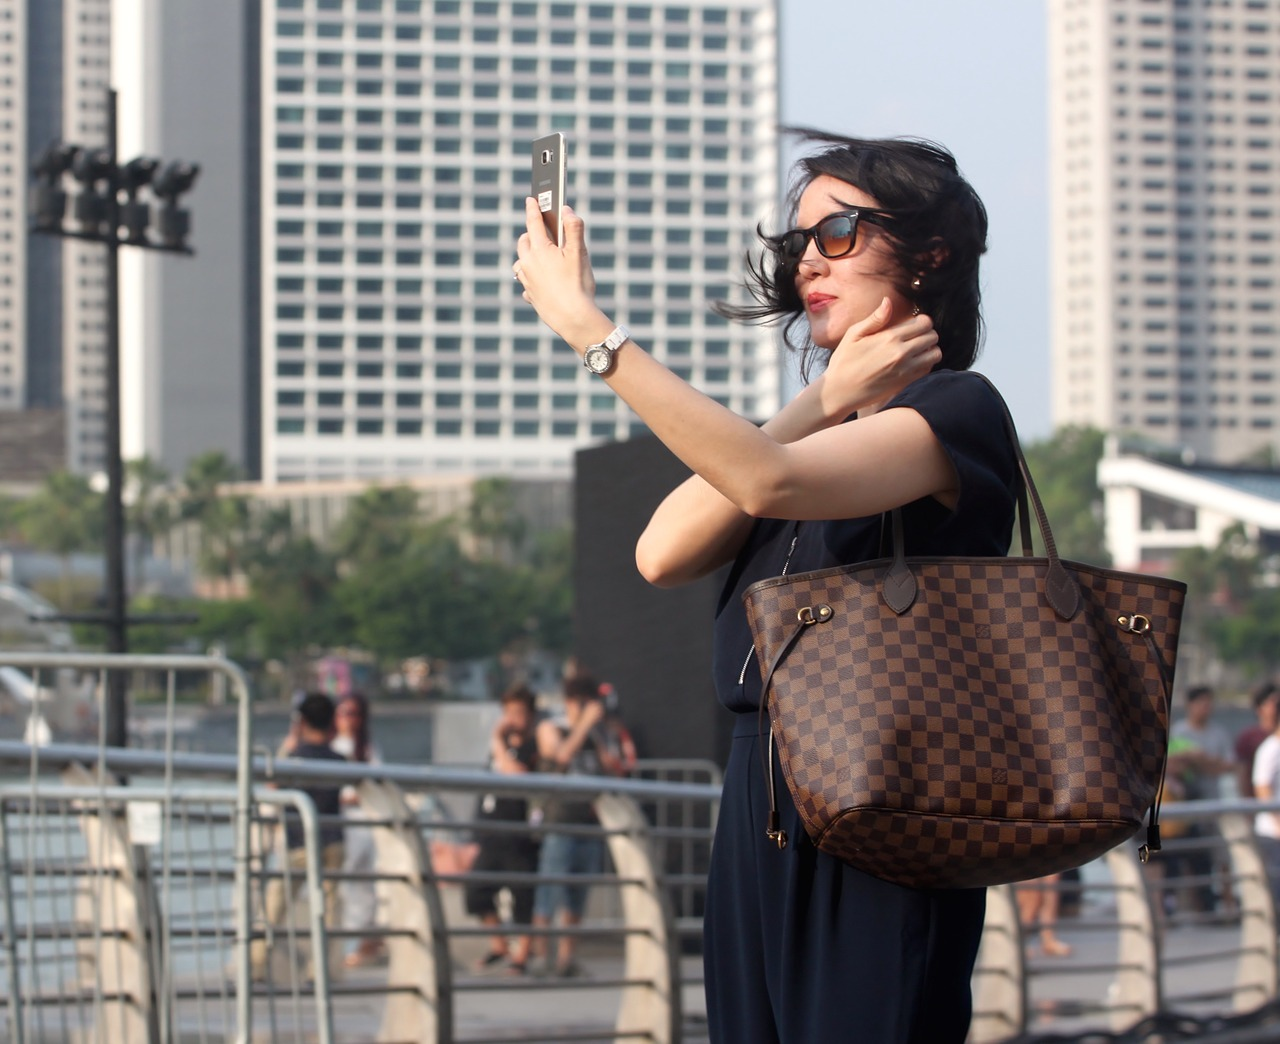 bloger robi selfie